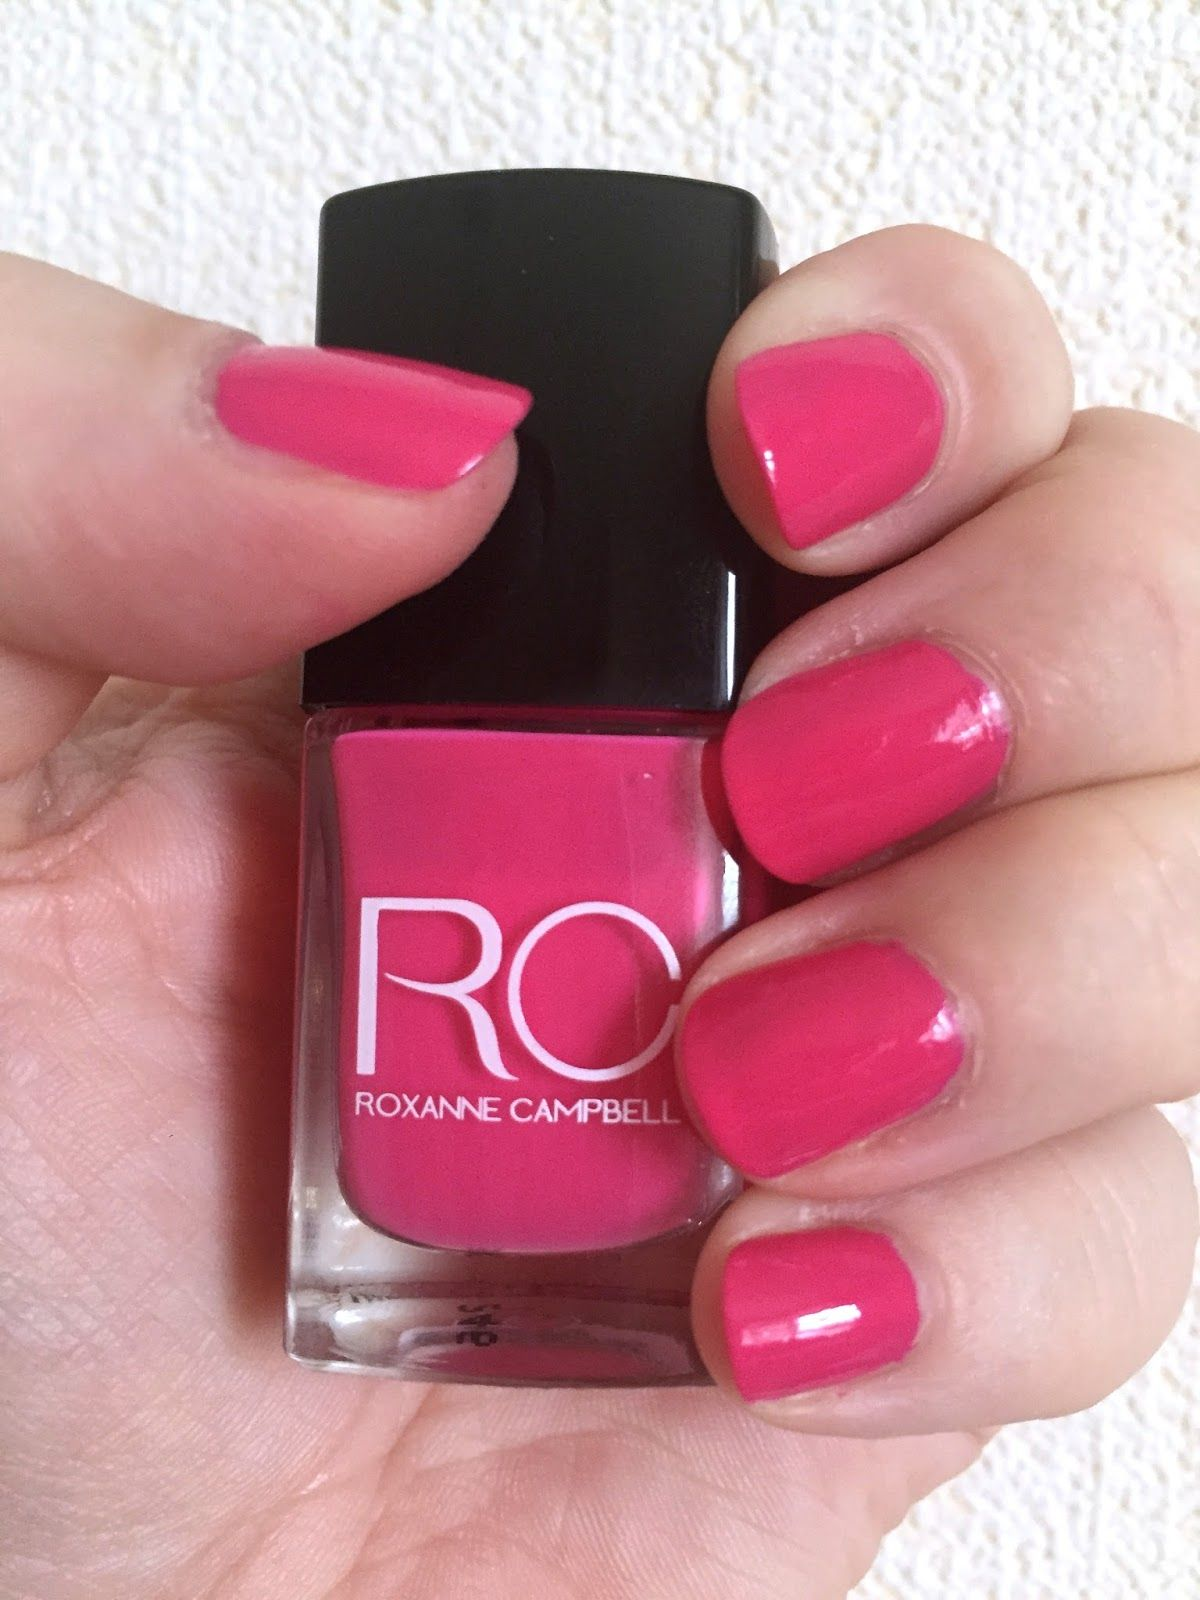 A New Nail Polish Brand - Roxanne Campbell | Nail polish brands ...